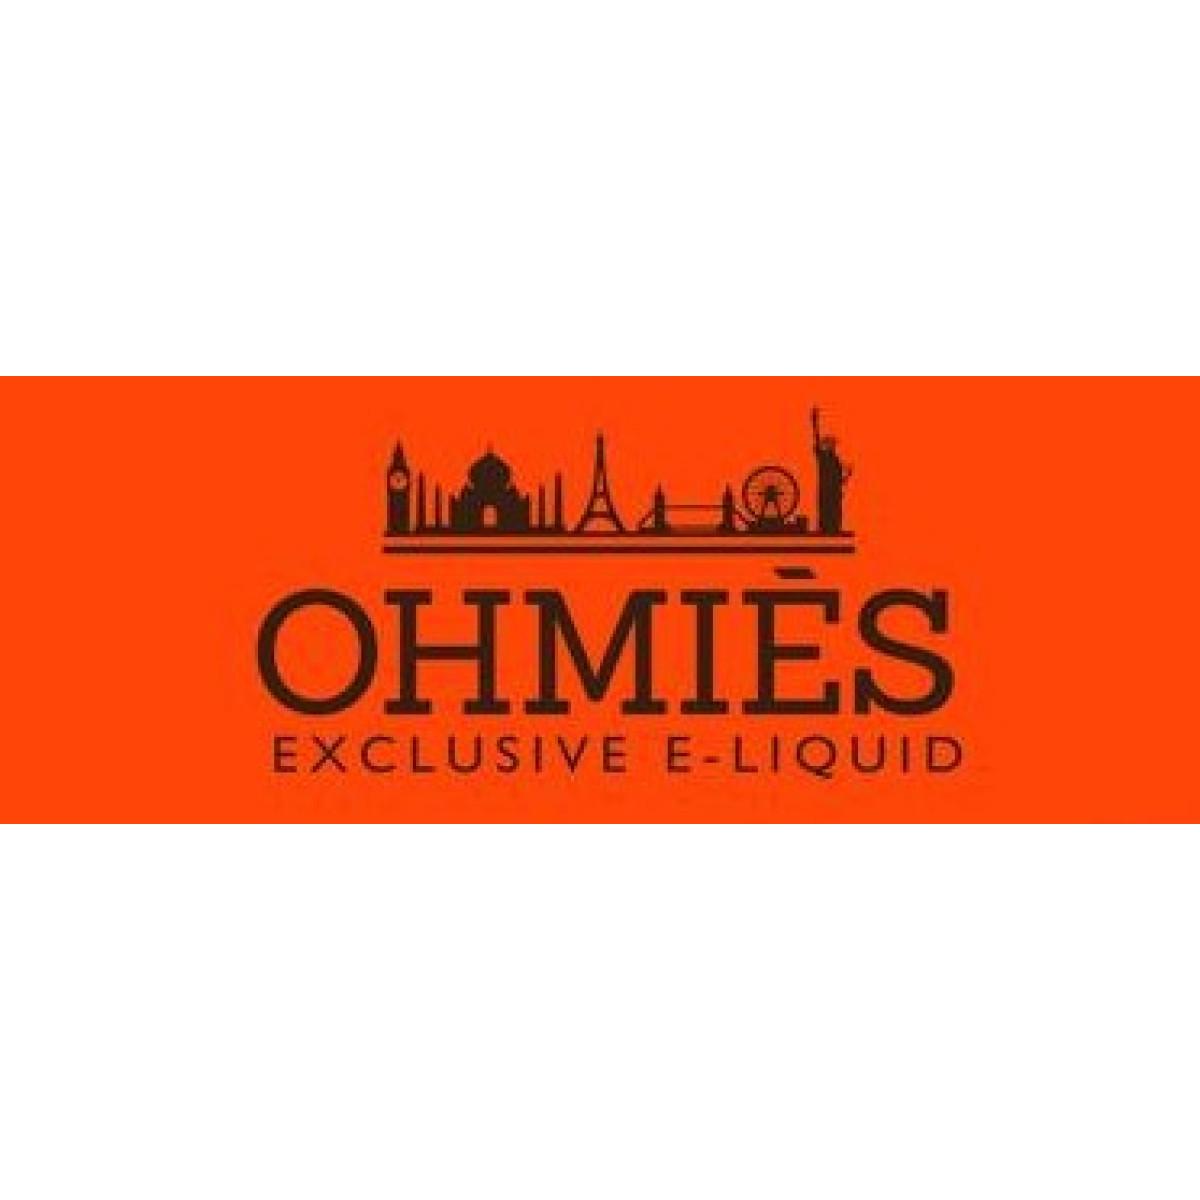 OHMIES Flavor's